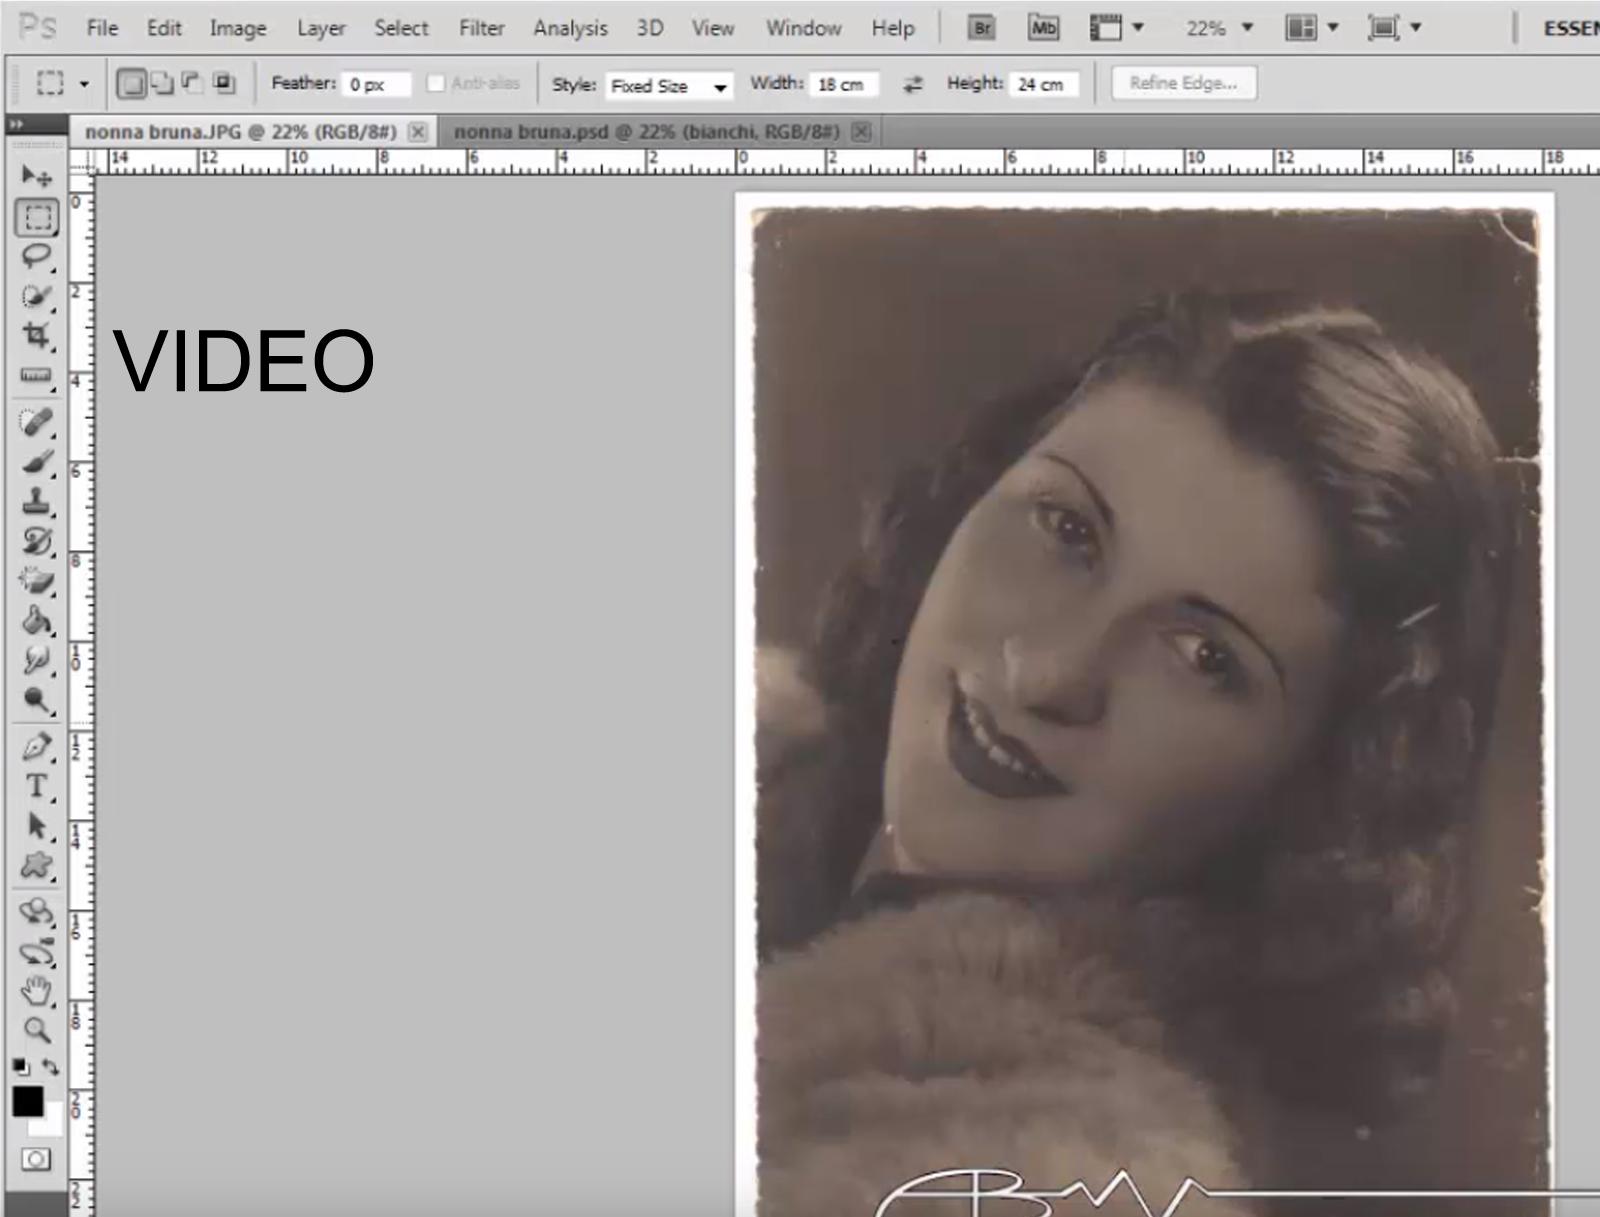 open day corso gratuito photoshop a roma archibit corsi gratis